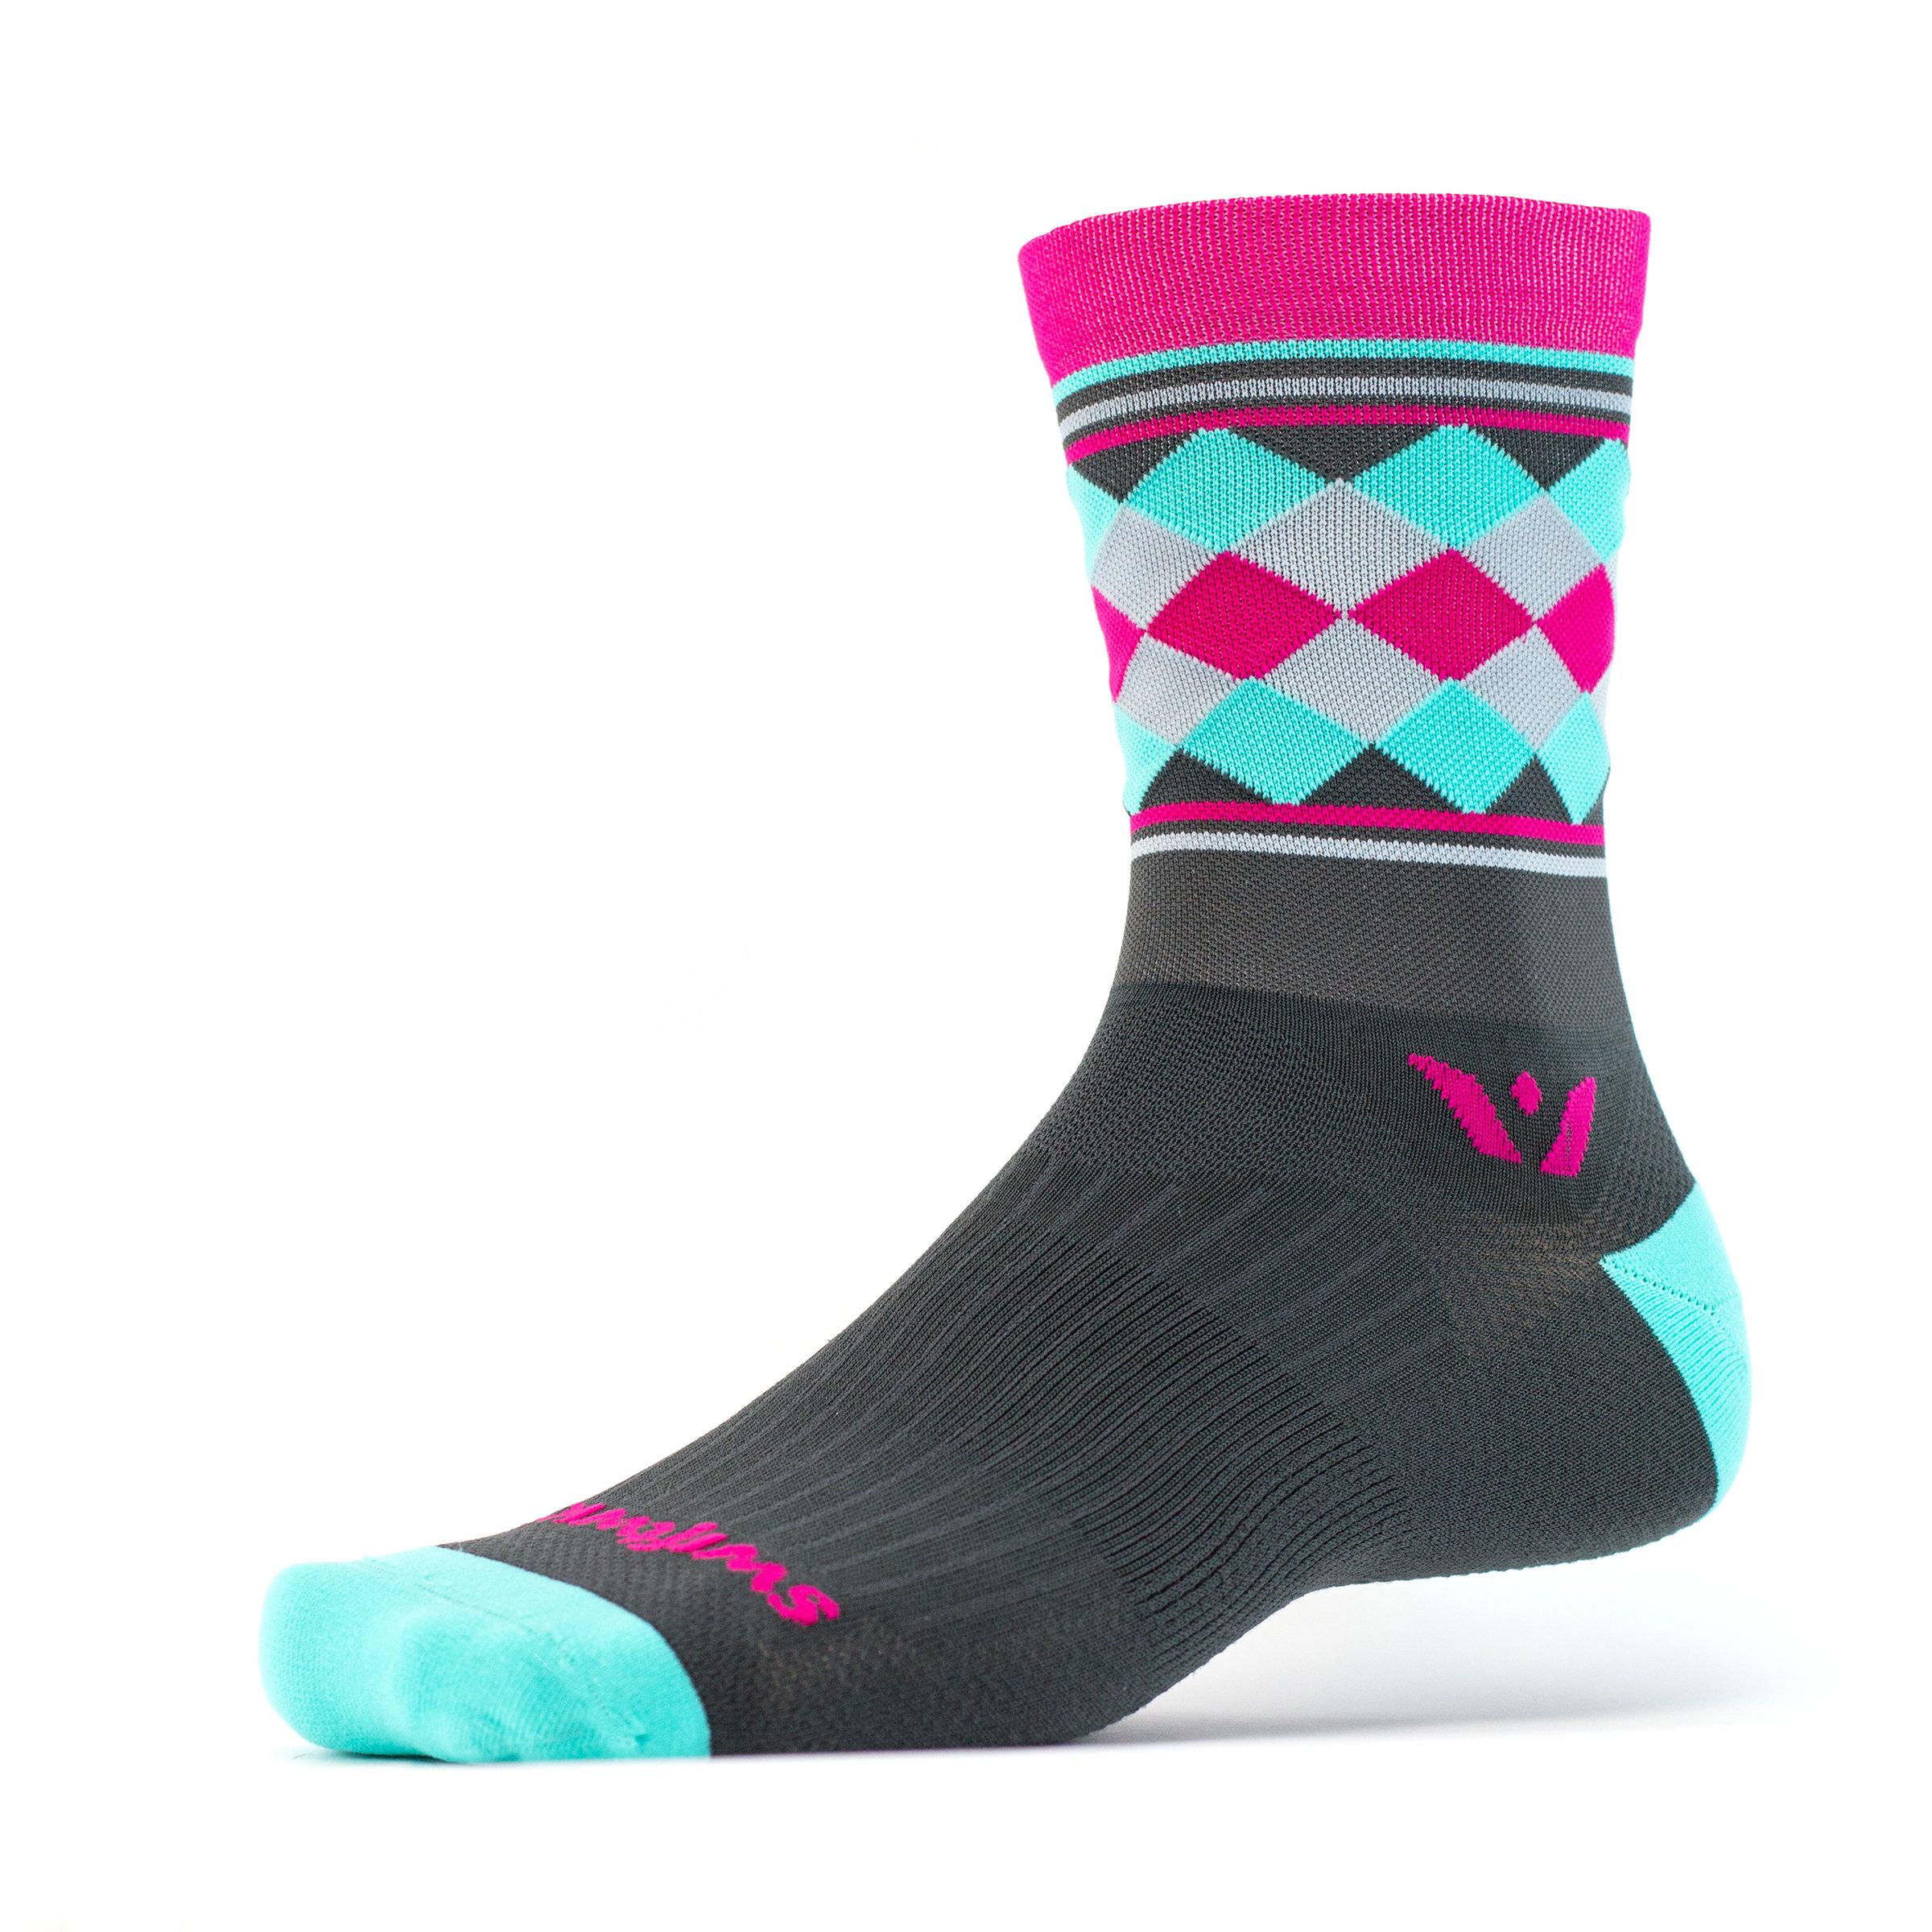 Swiftwick Vision Five Argyle Stripe Crew Socks